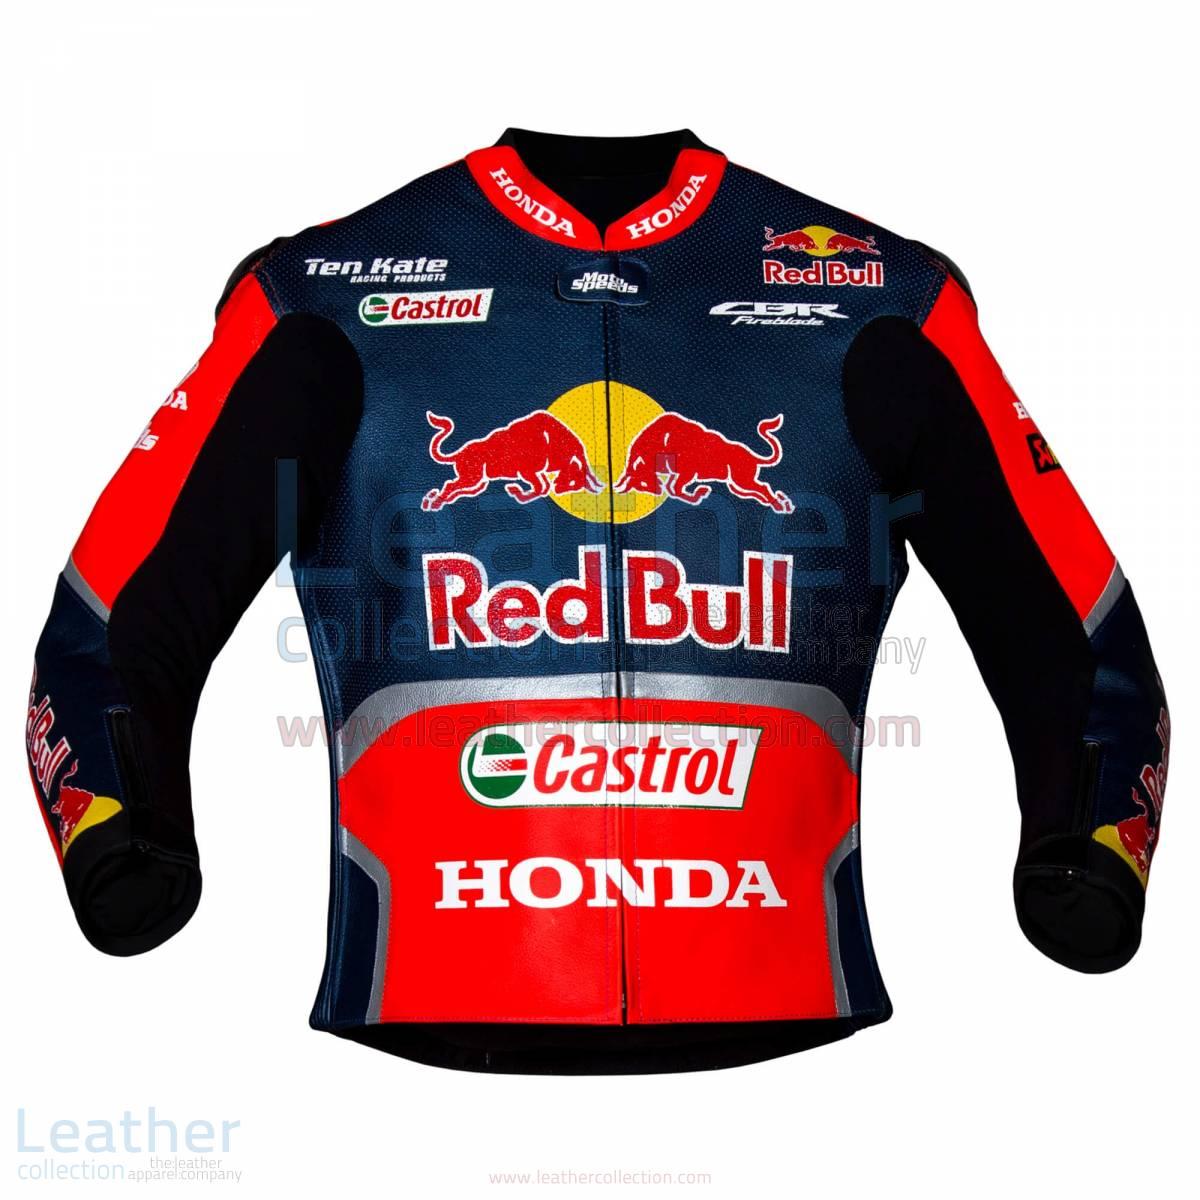 Nicky Hayden Red Bull Honda WSBK 2017 Race Jacket